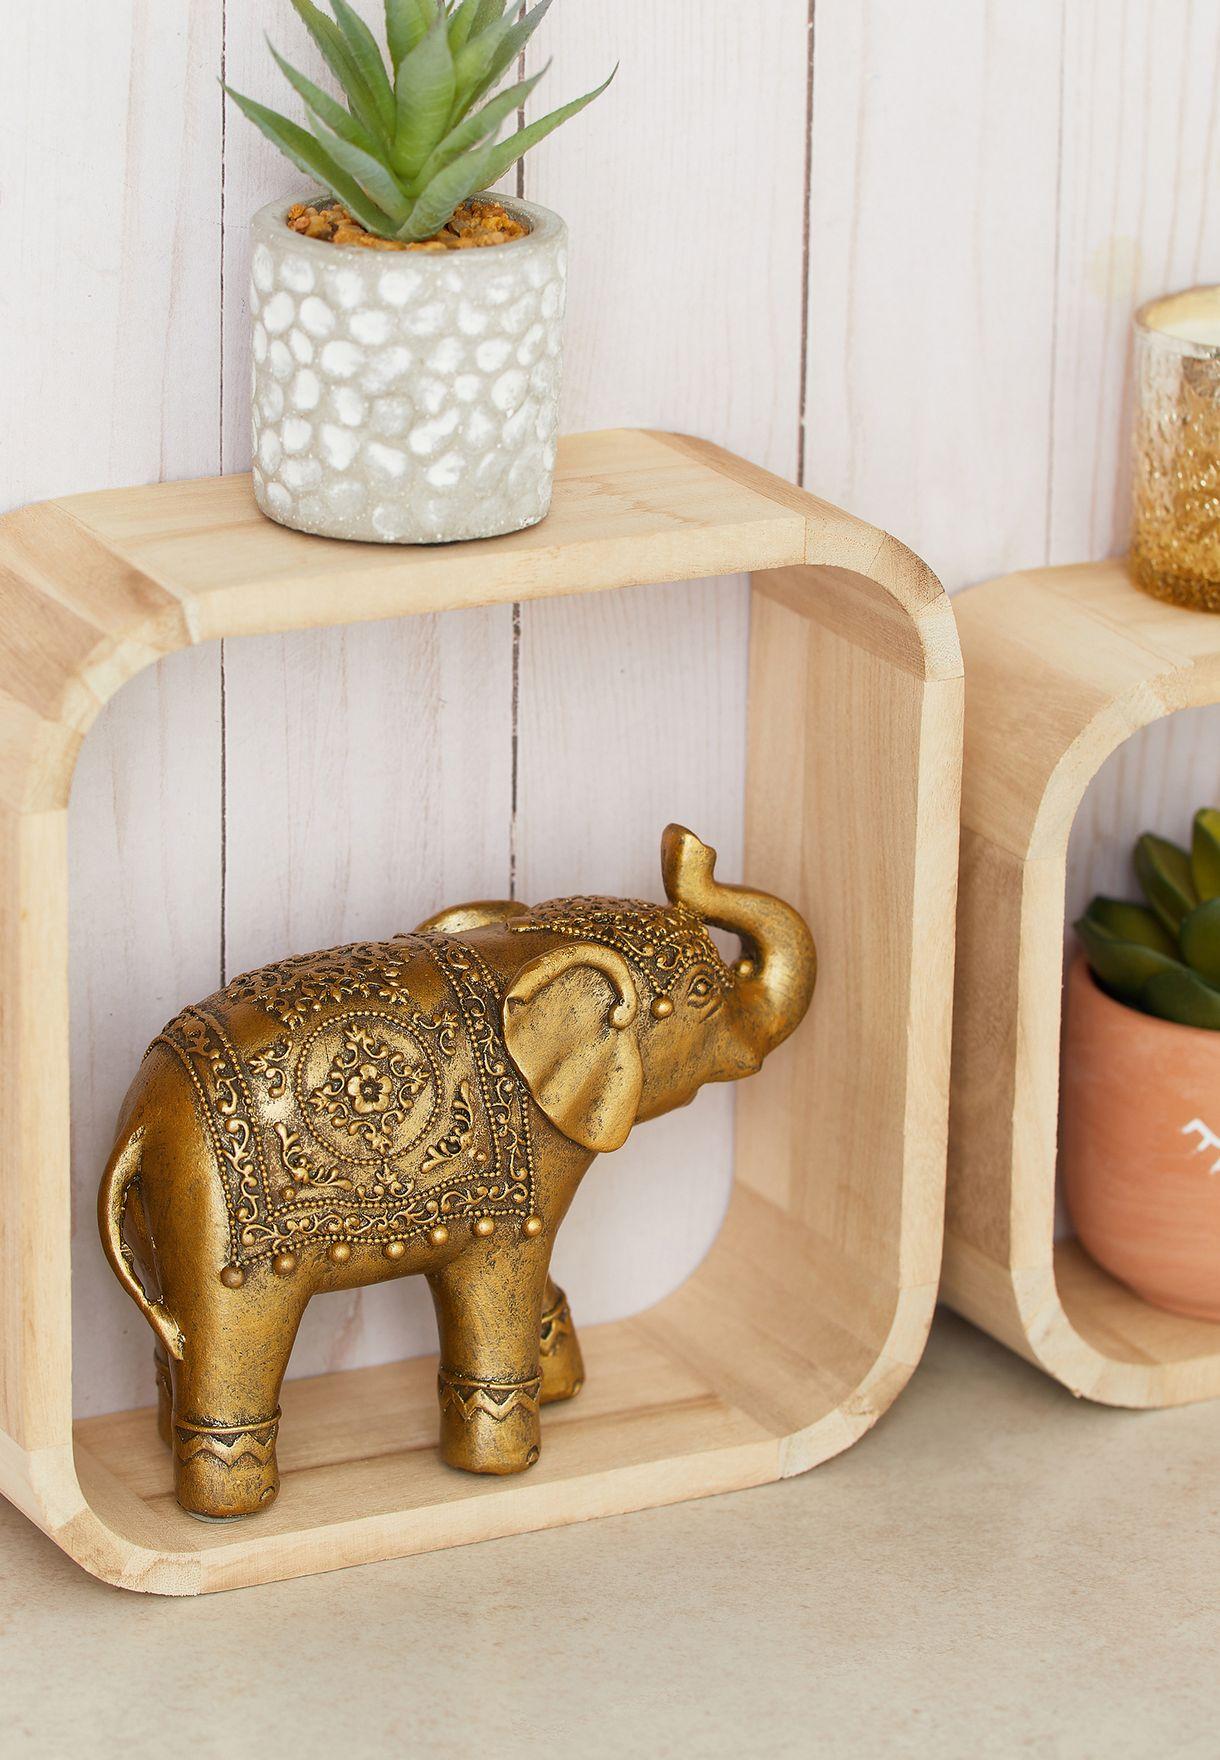 Elephant Room Decor - 15x5.5x13cm